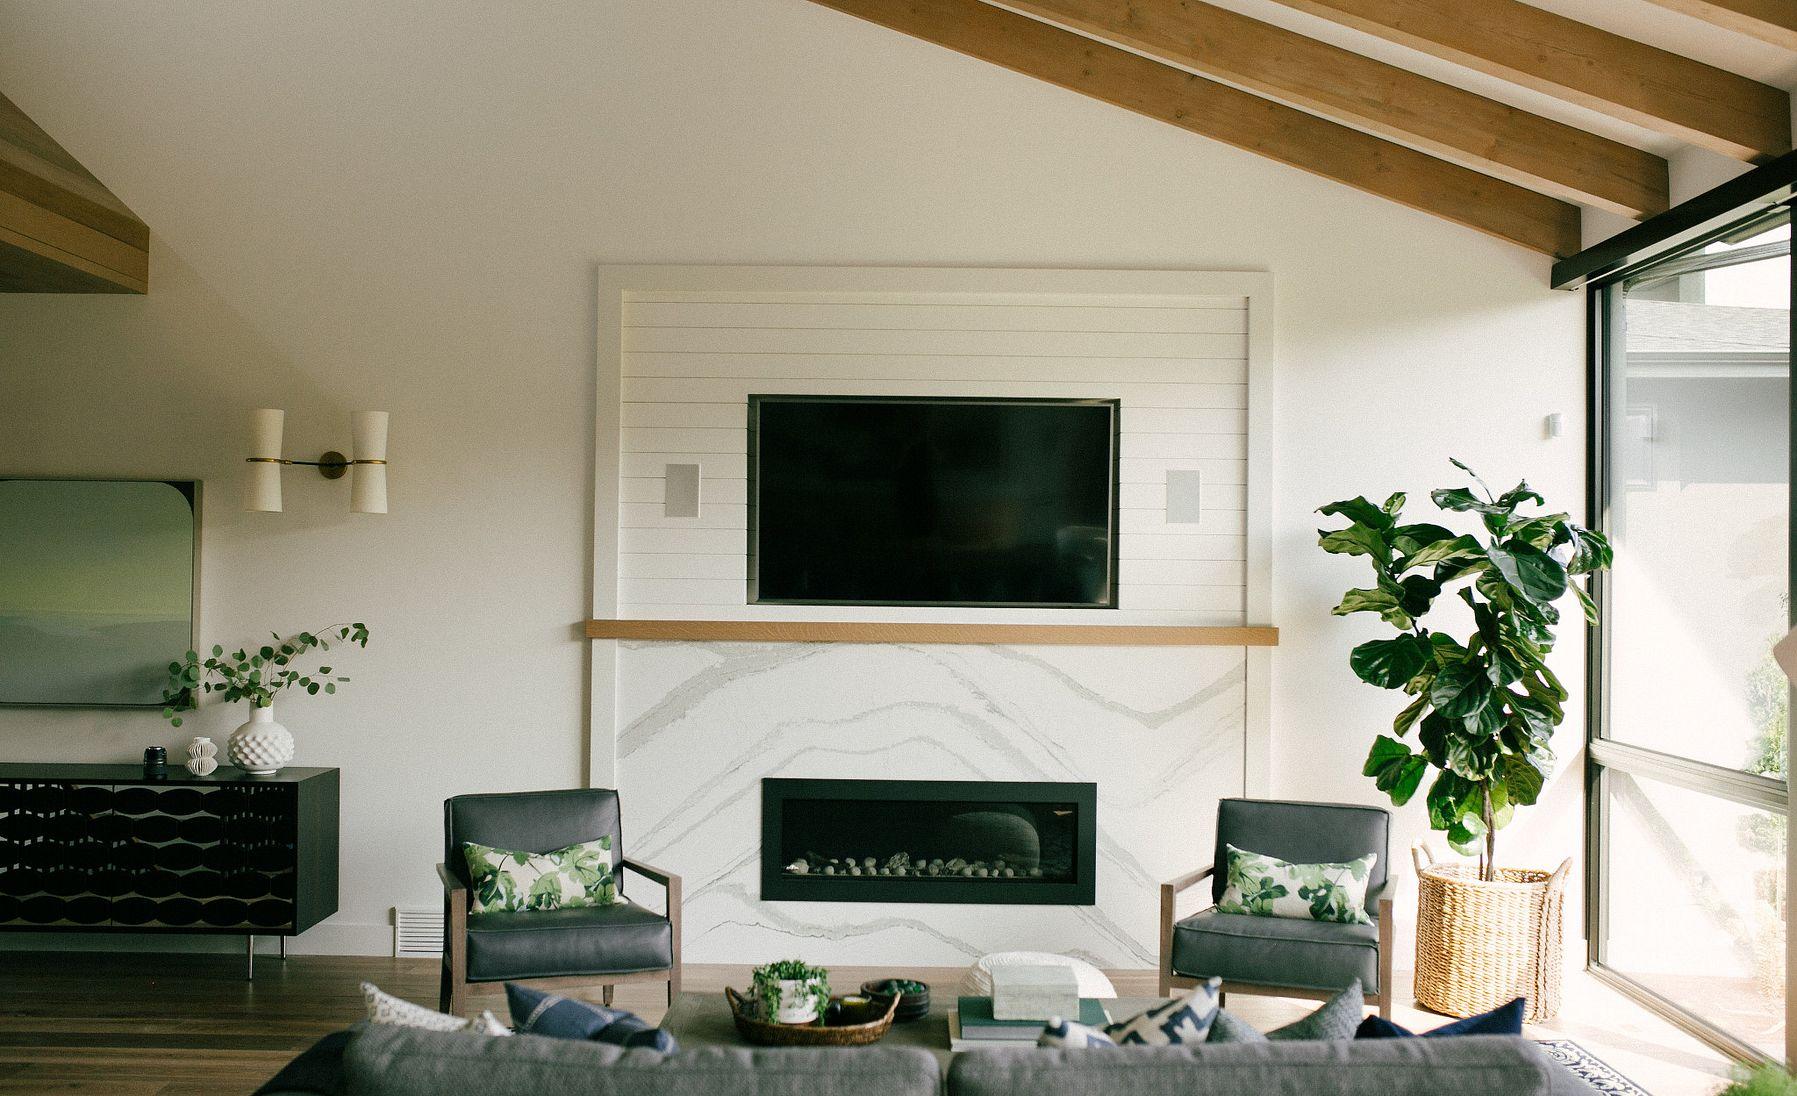 Cambria Brittanicca quartz fireplace surround.